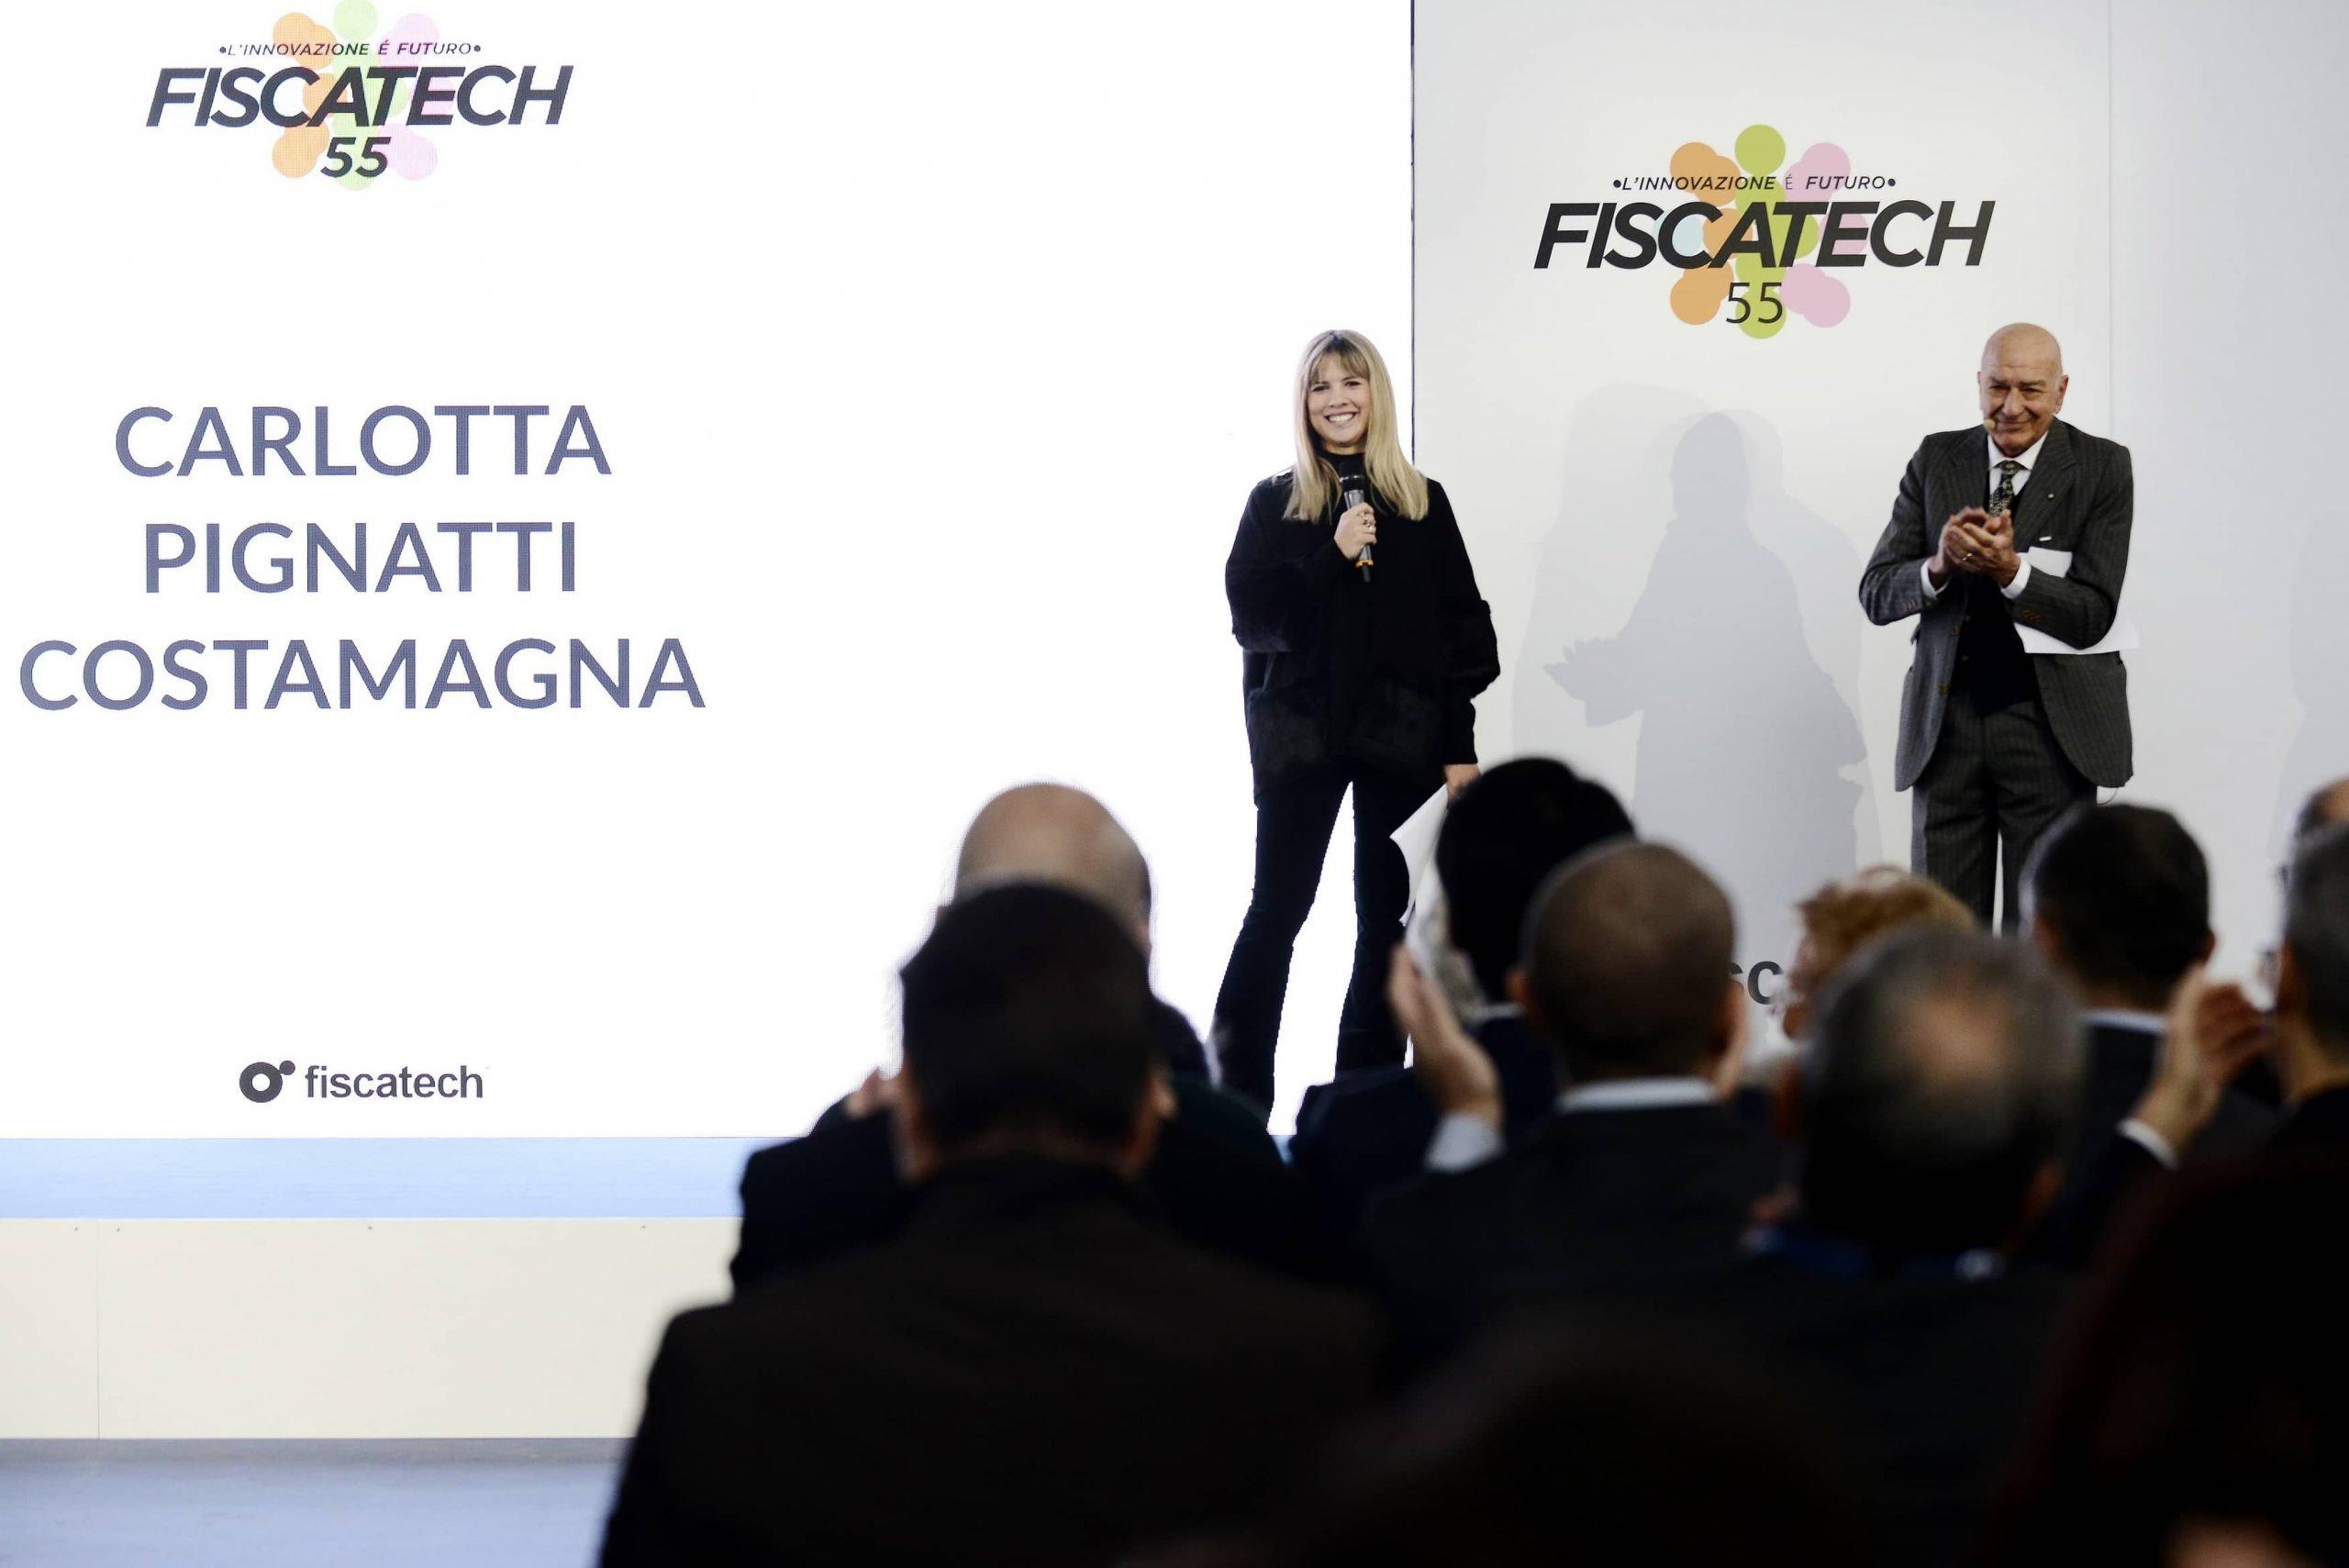 fiscatech-55-foto-1